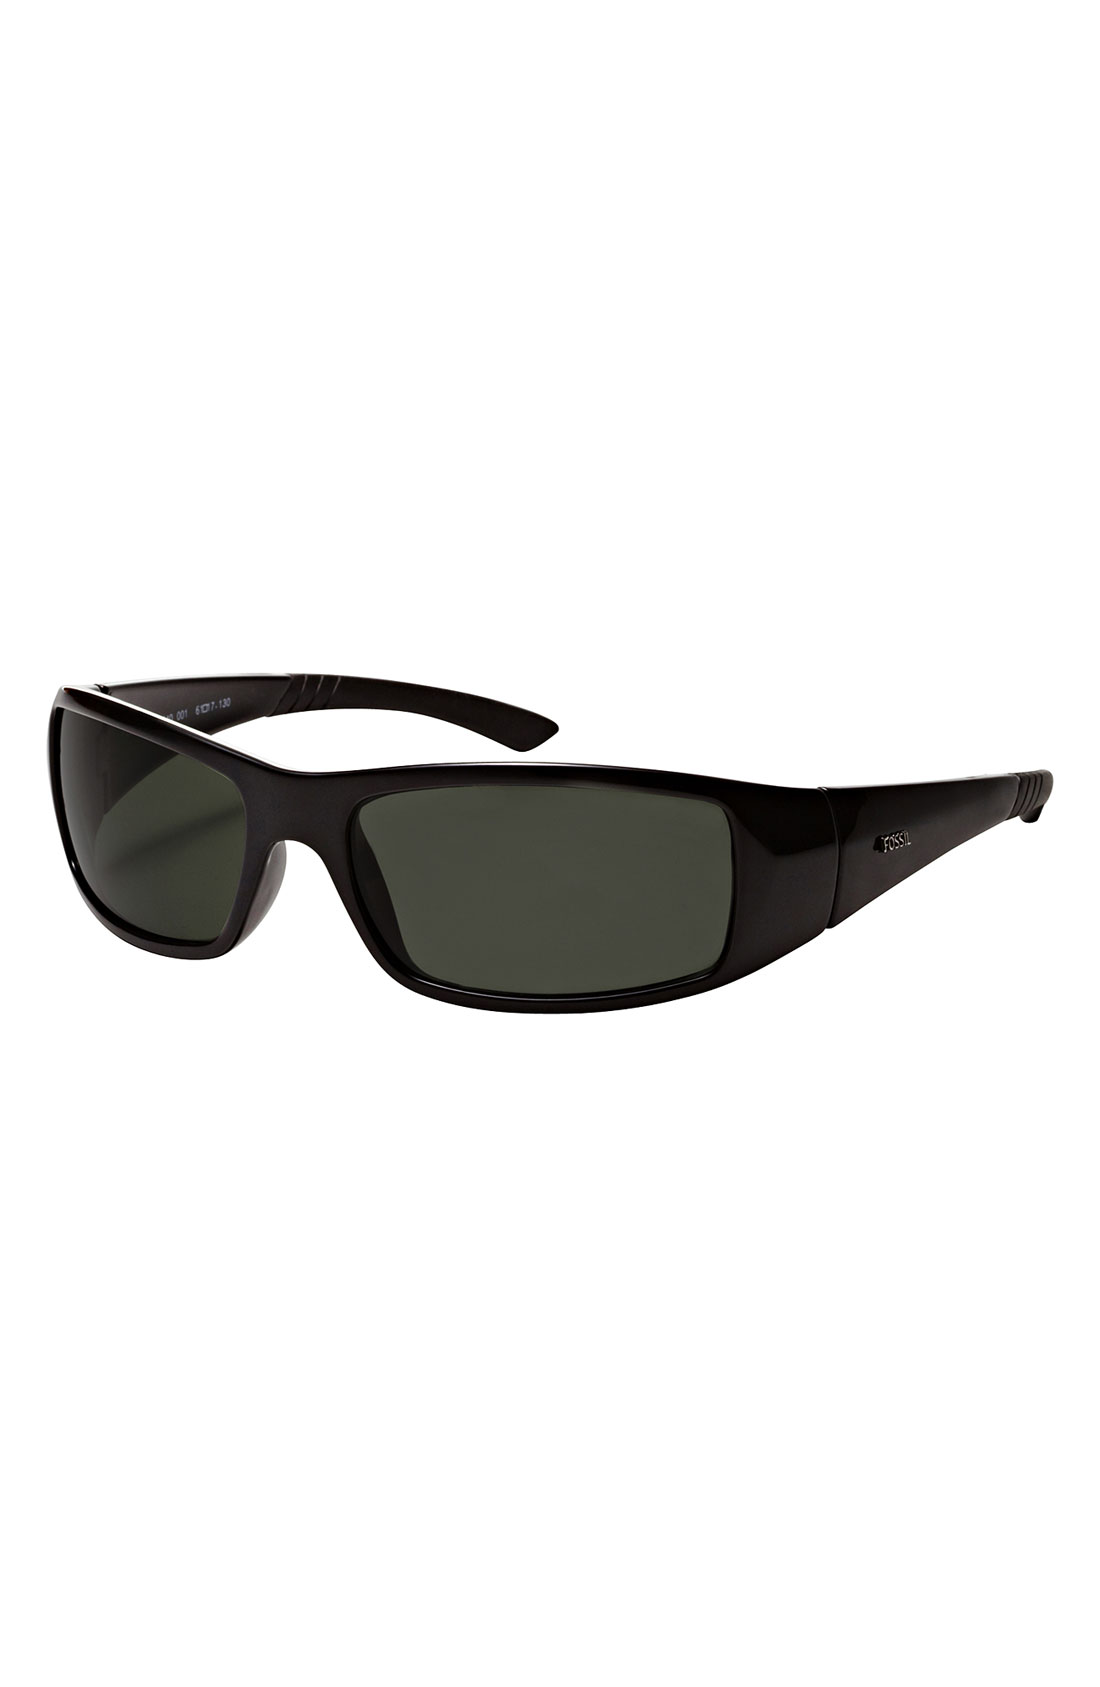 b60b439eb29c Fossil Men s Polarized Sunglasses